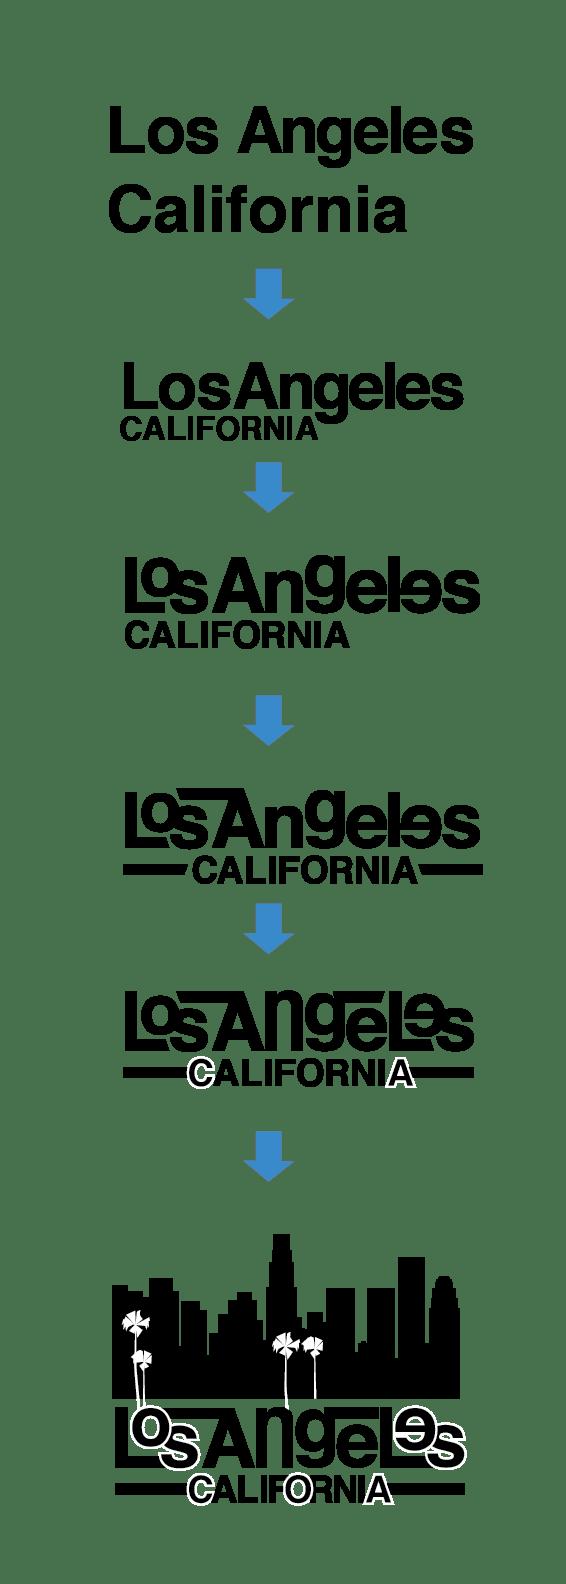 LA Wordmark - image 1 - student project